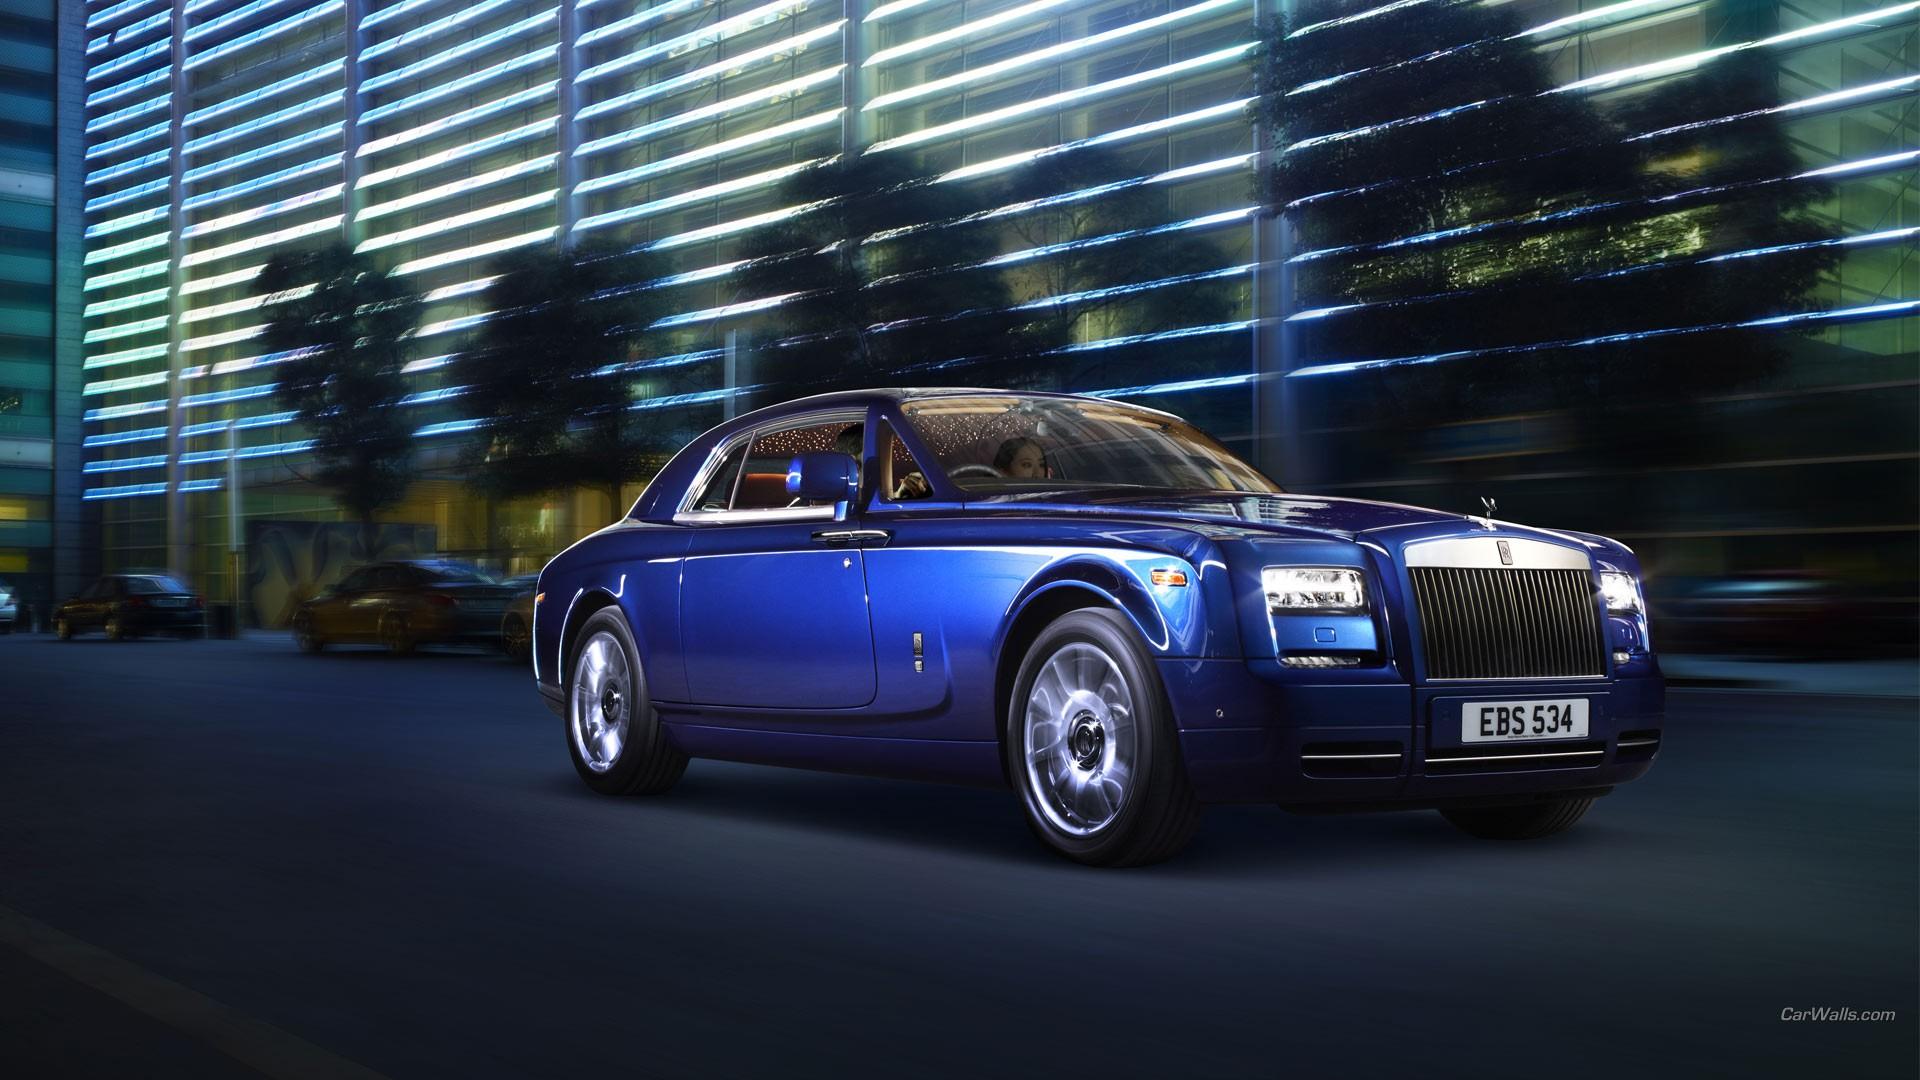 Roll Royce Car Hd Wallpaper Car Rolls Royce Phantom Blue Cars Wallpapers Hd